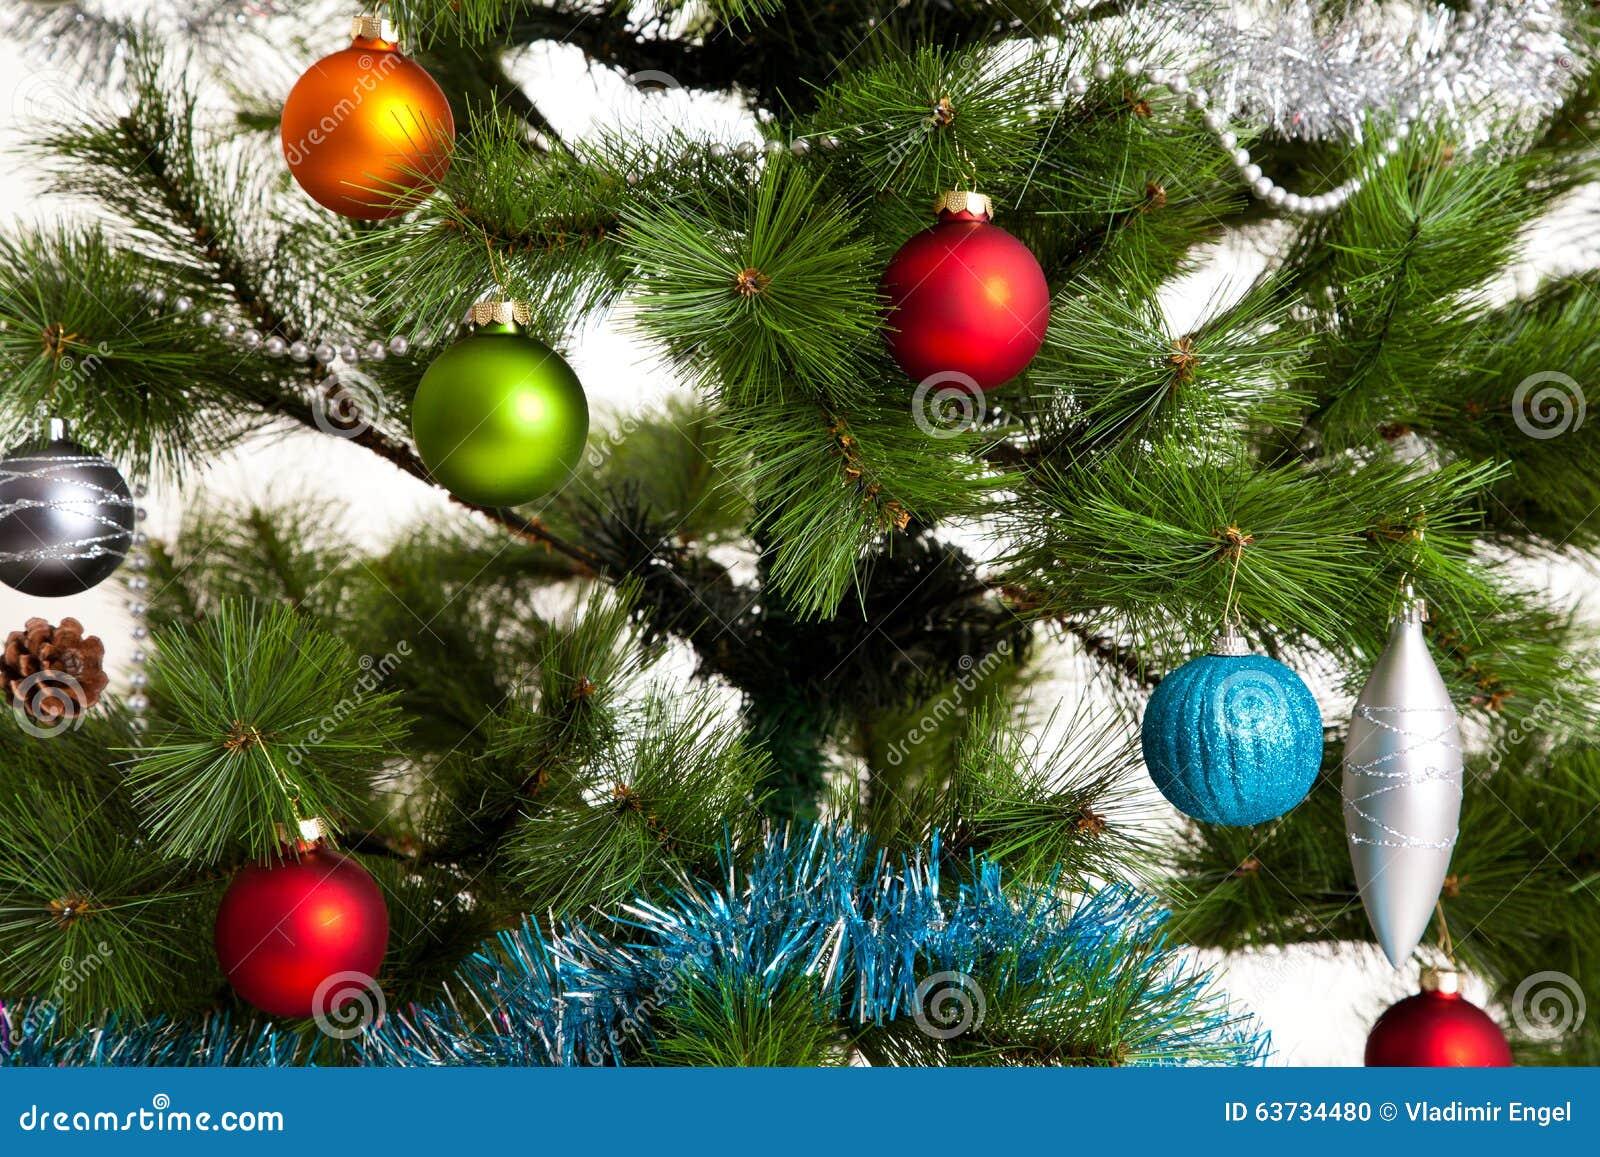 Christmas tree decorations happy new year stock photo for New xmas decorations